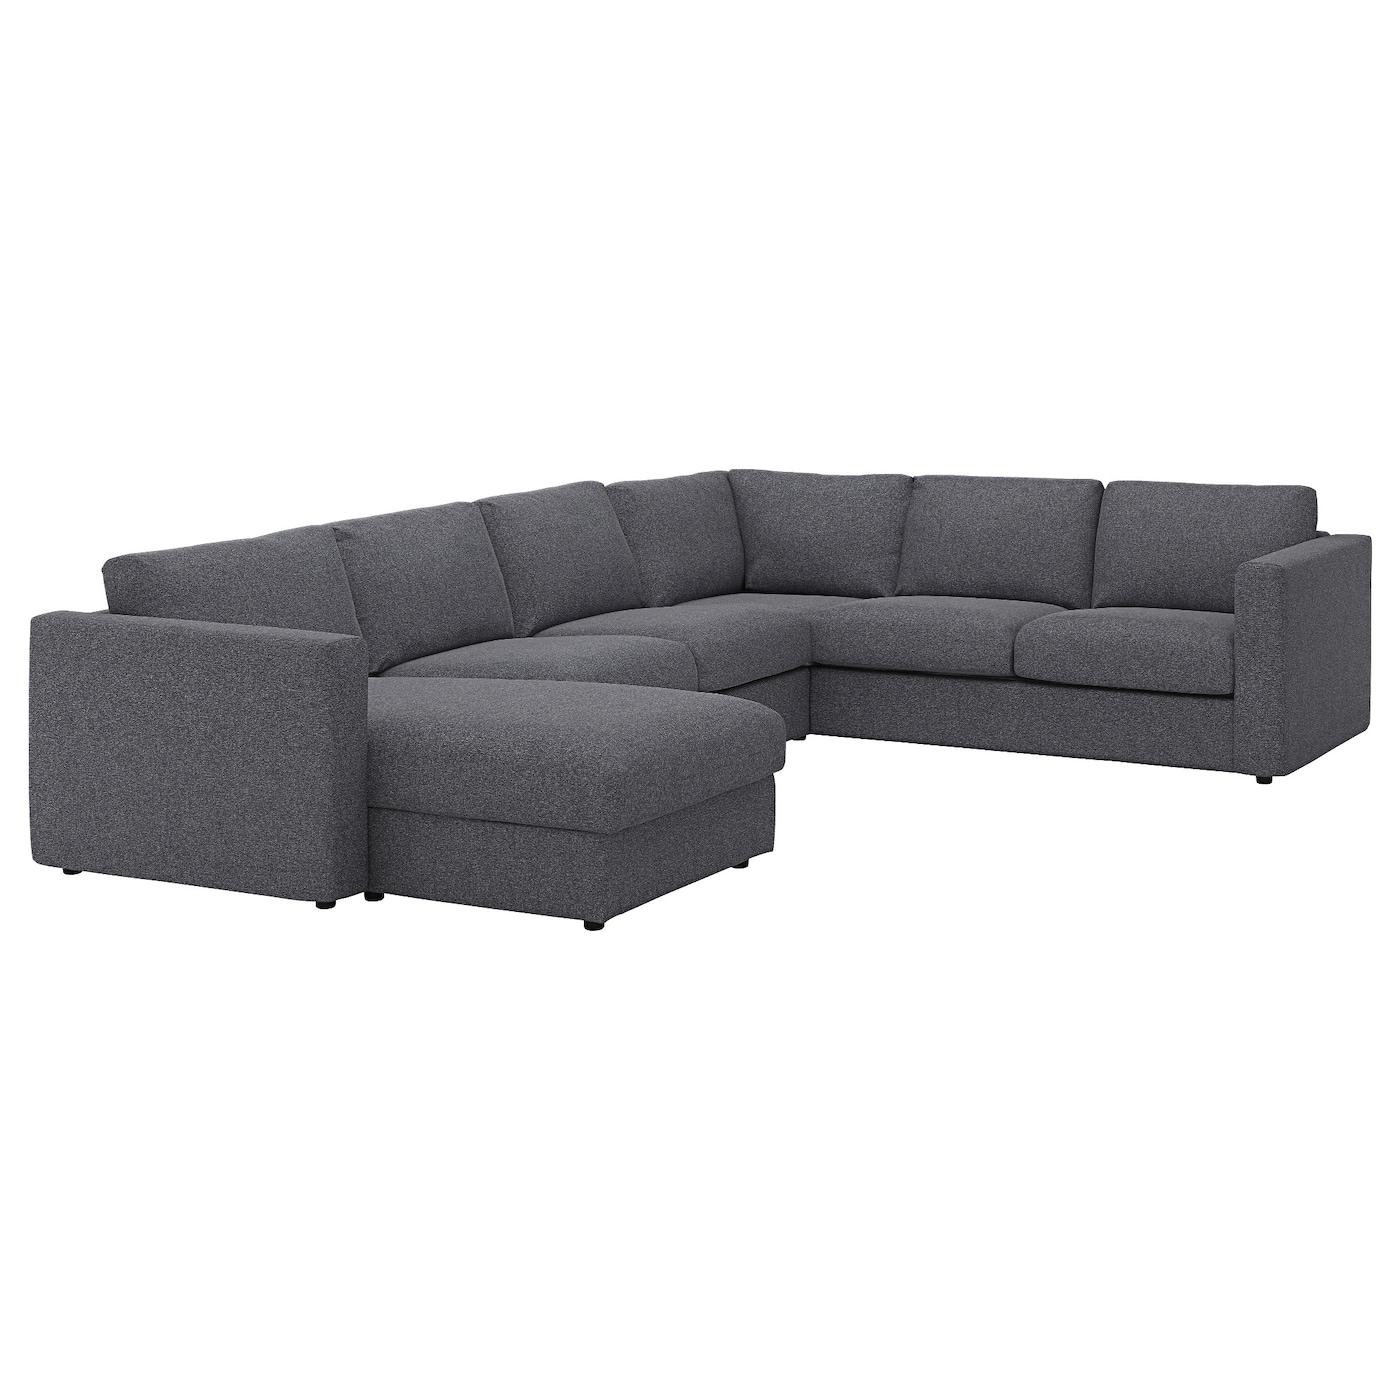 Hoekbank Chaise Lounge.Vimle Hoekbank 5 Zits Met Chaise Longue Gunnared Middengrijs Ikea